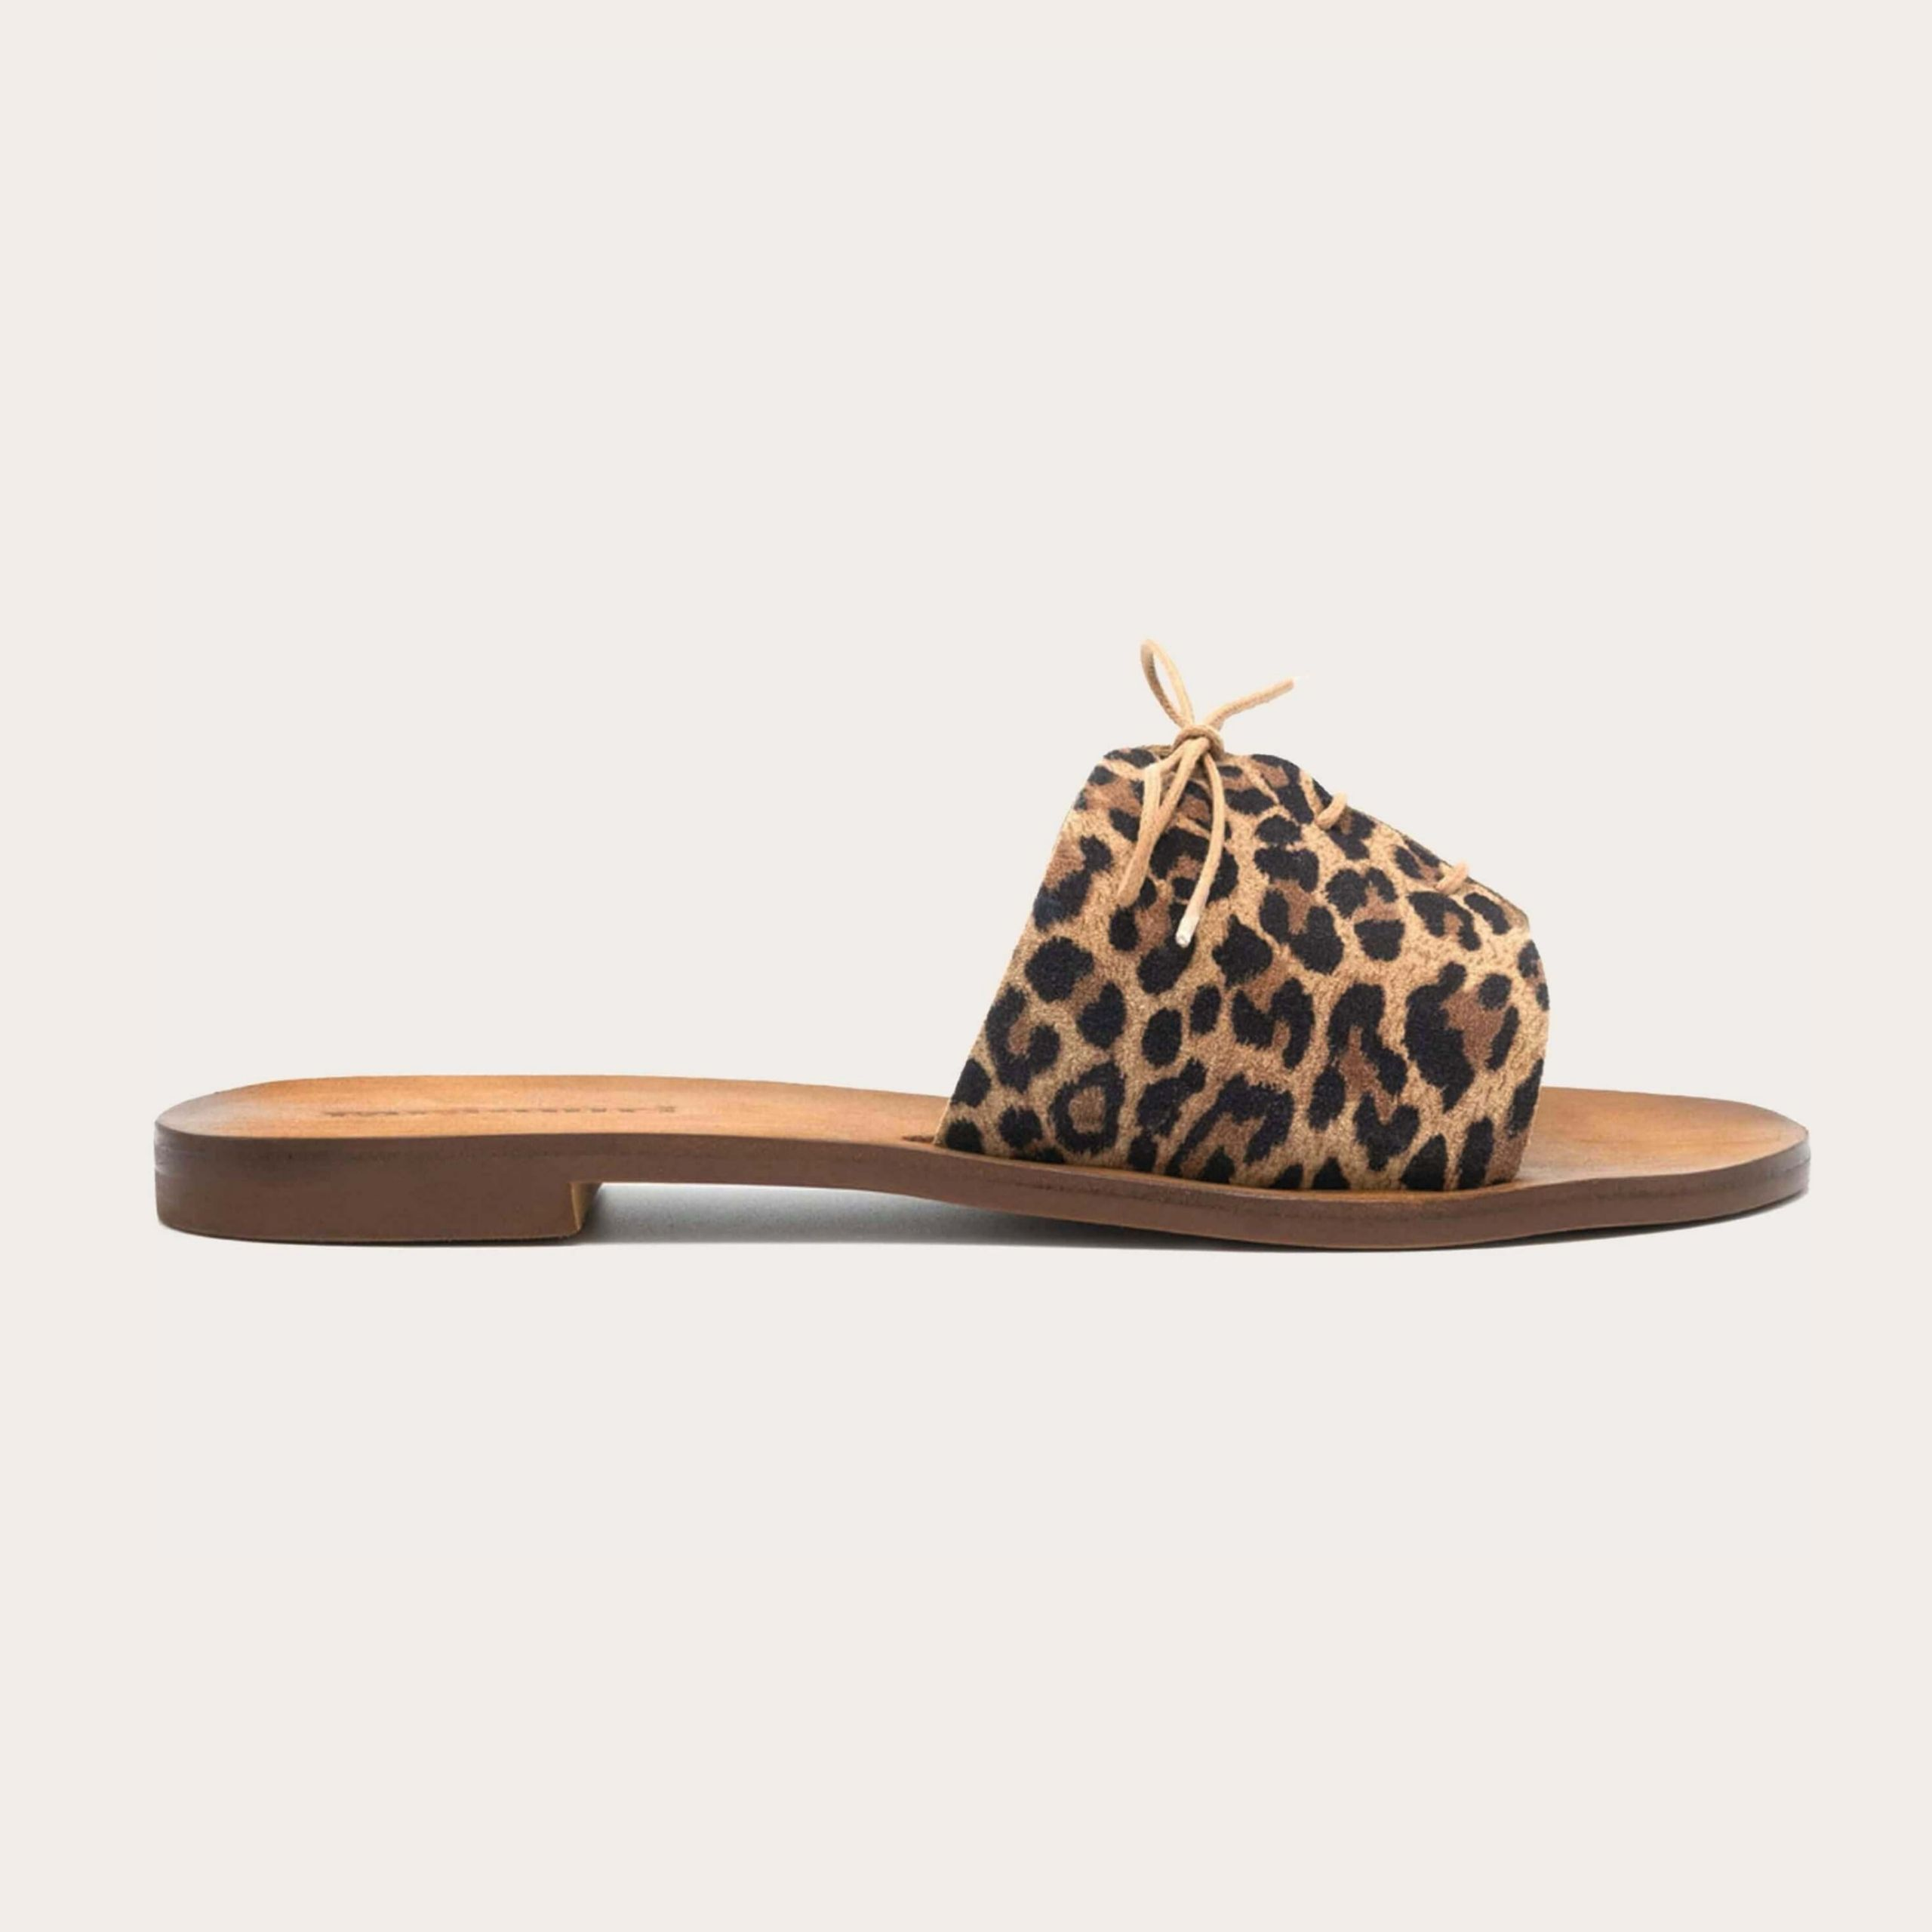 cali-leopard_1_lintsandalen sandals travelsandals vegan sustainable sandals wikkelsandalen